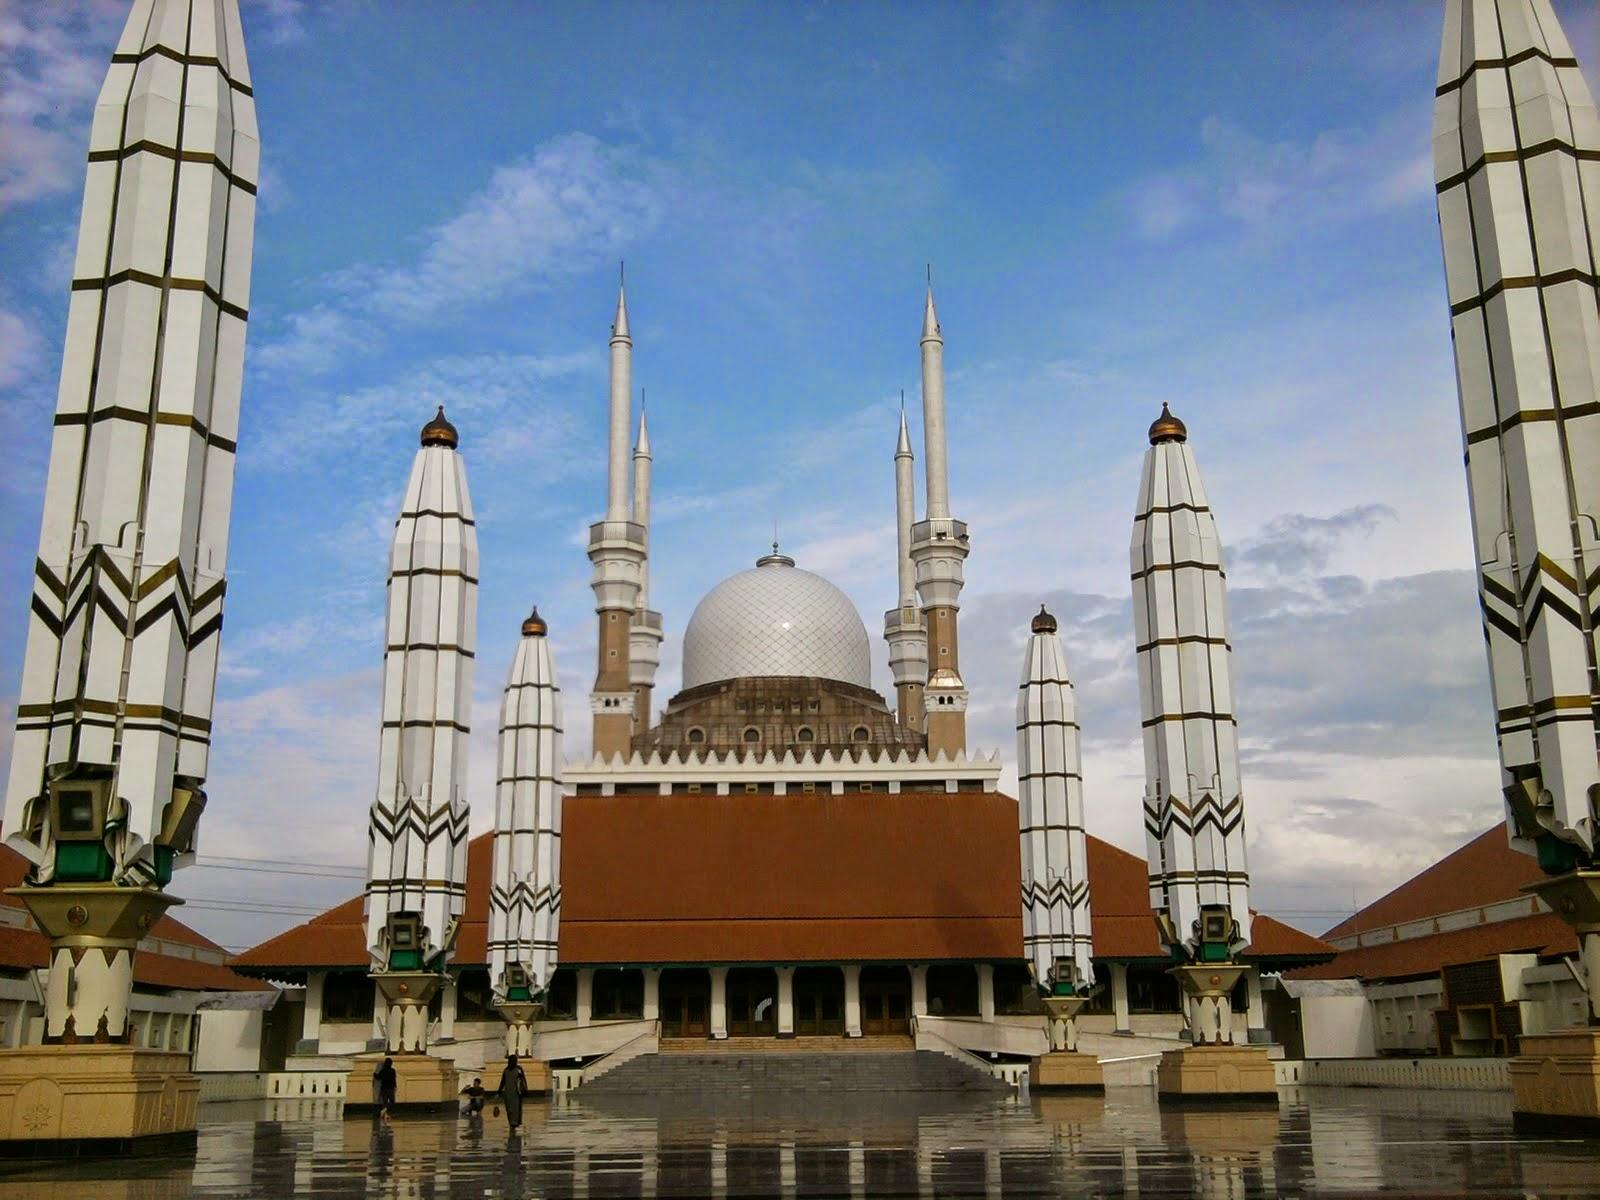 Masjid Agung Jawa Tengah di Semarang dari depan